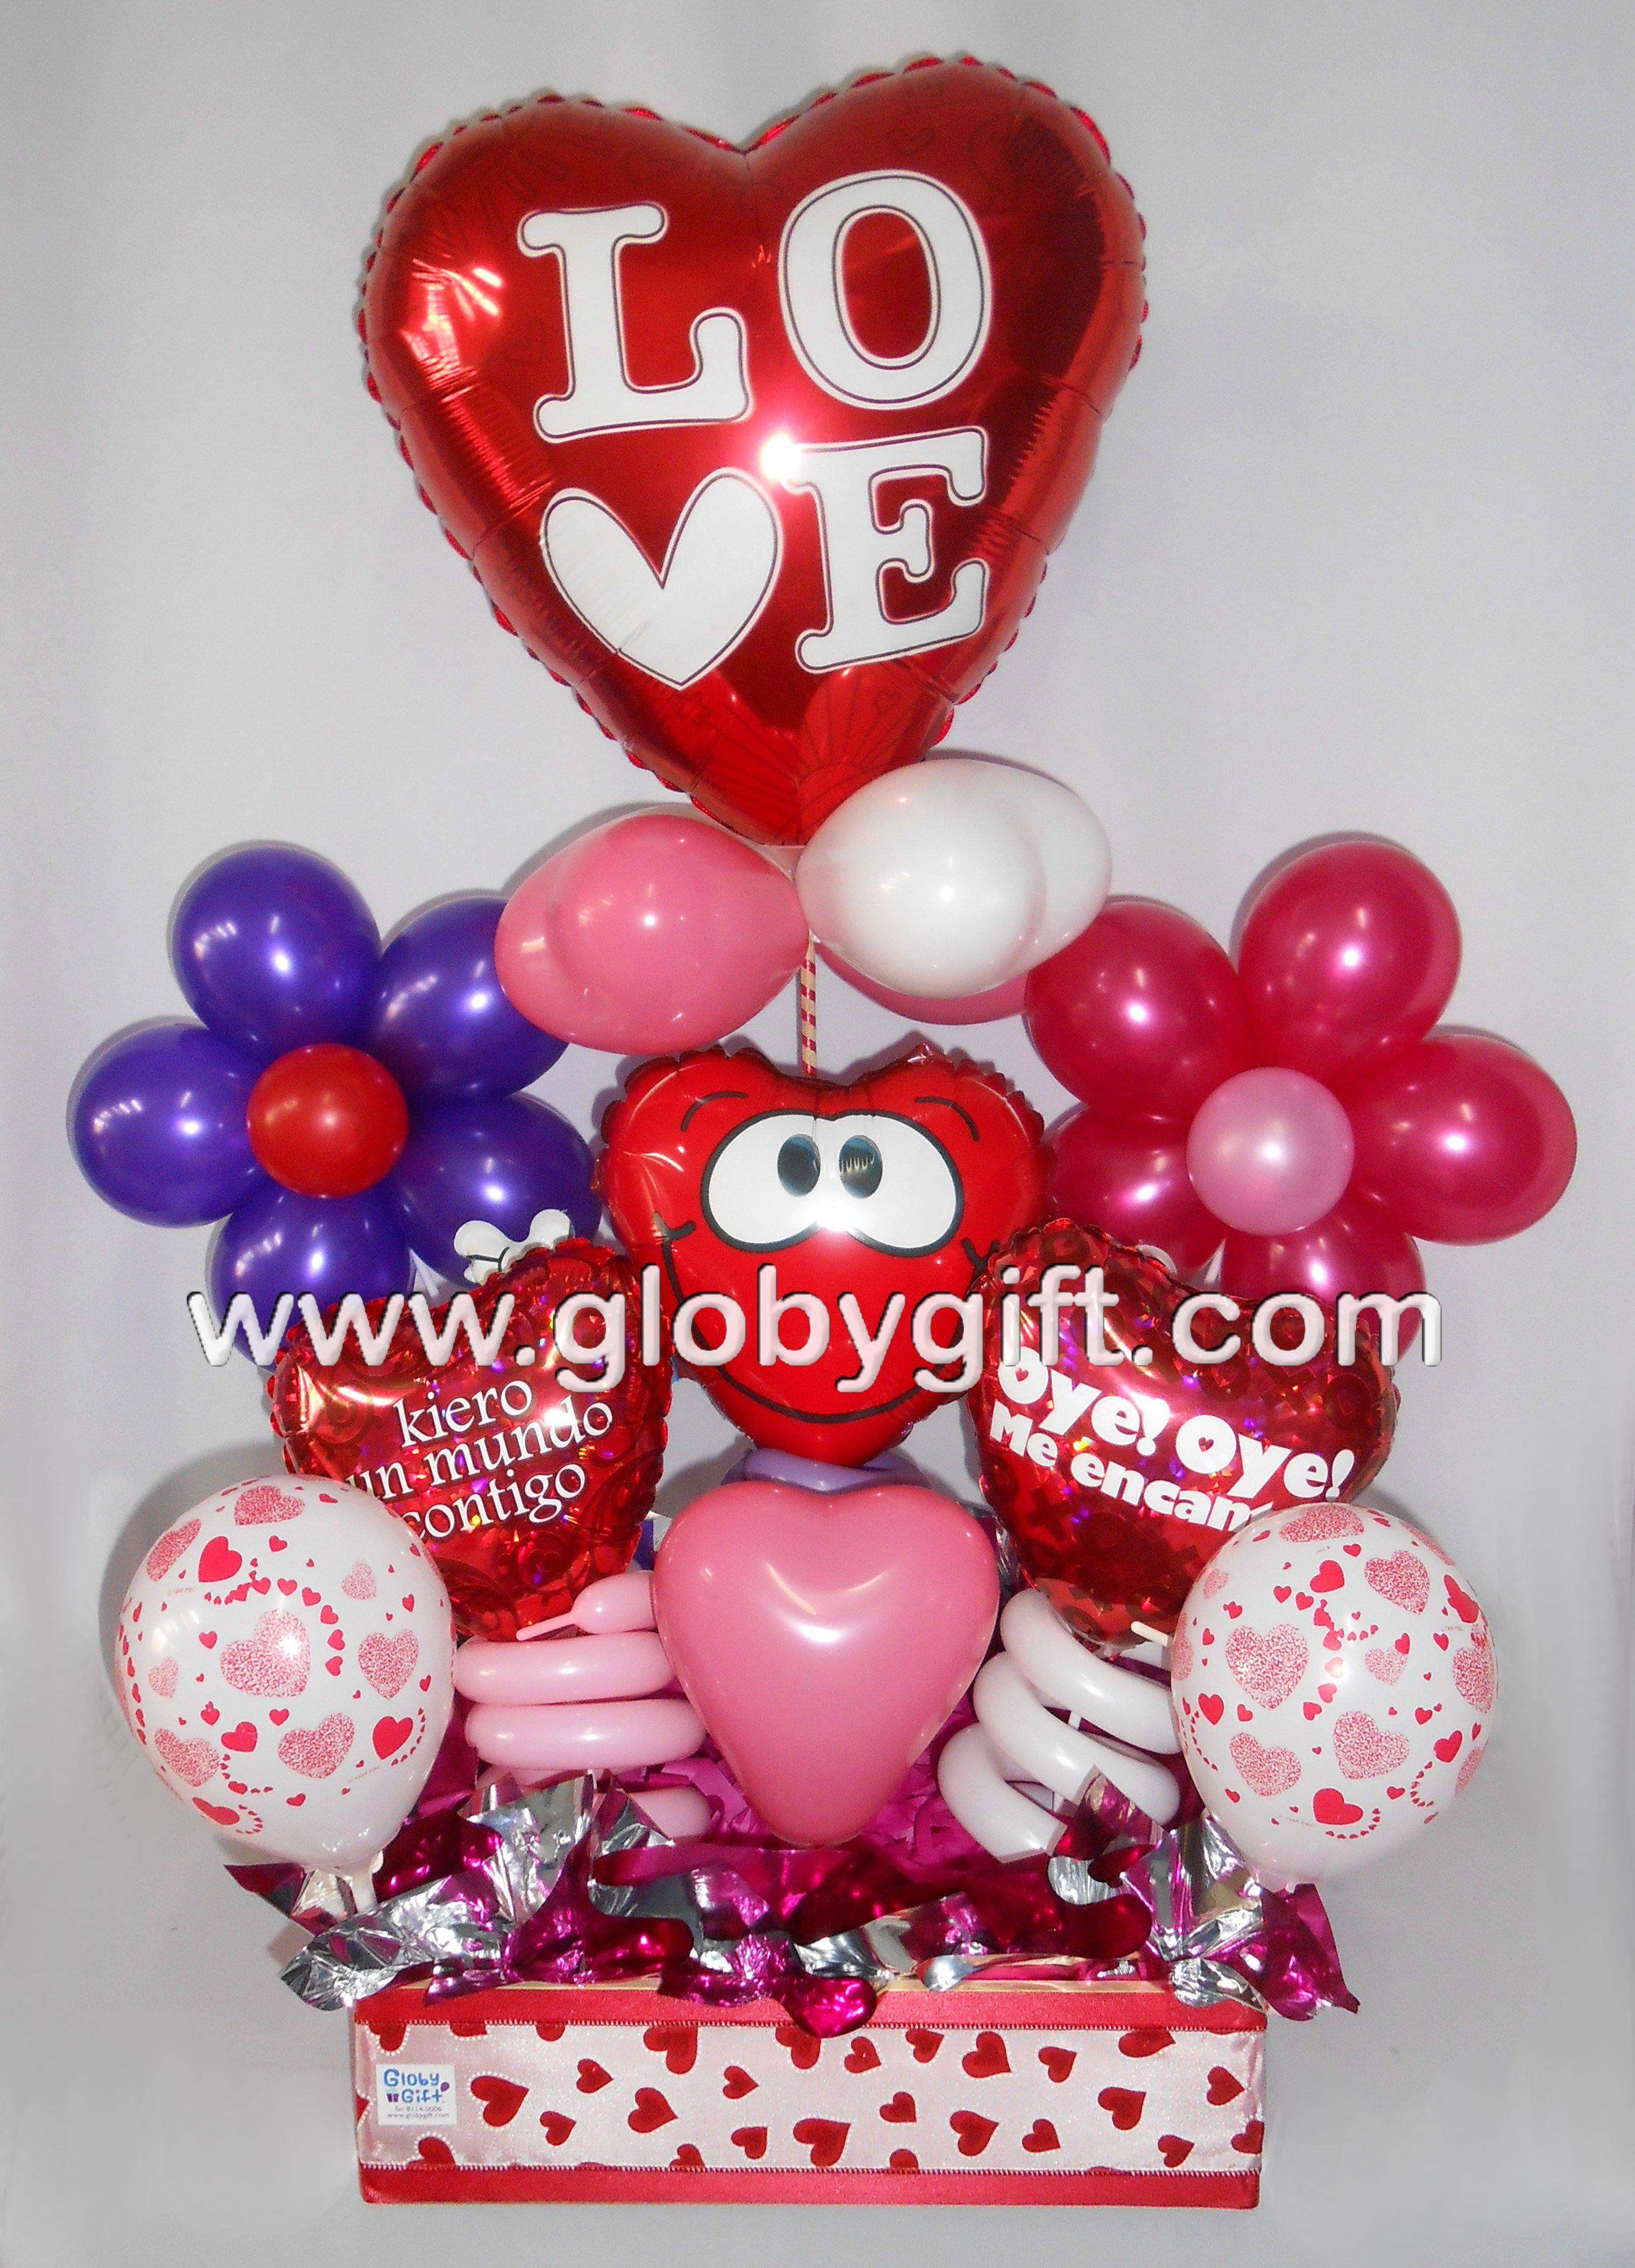 Arreglo de globos para San Valentín. | San Valentín | Pinterest ...